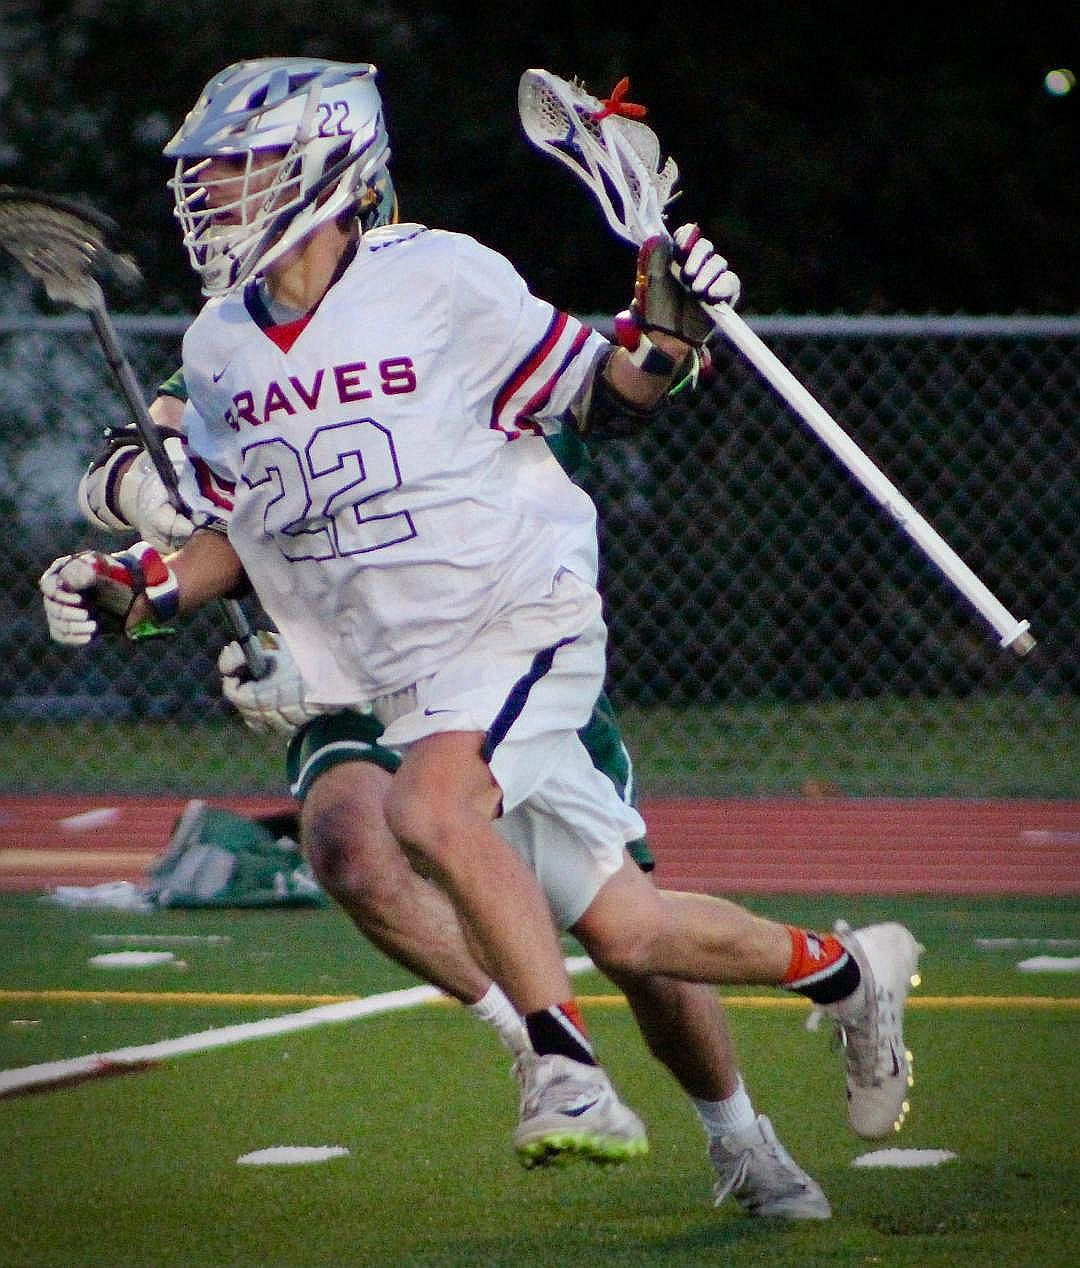 Justin-Siena boys lacrosse